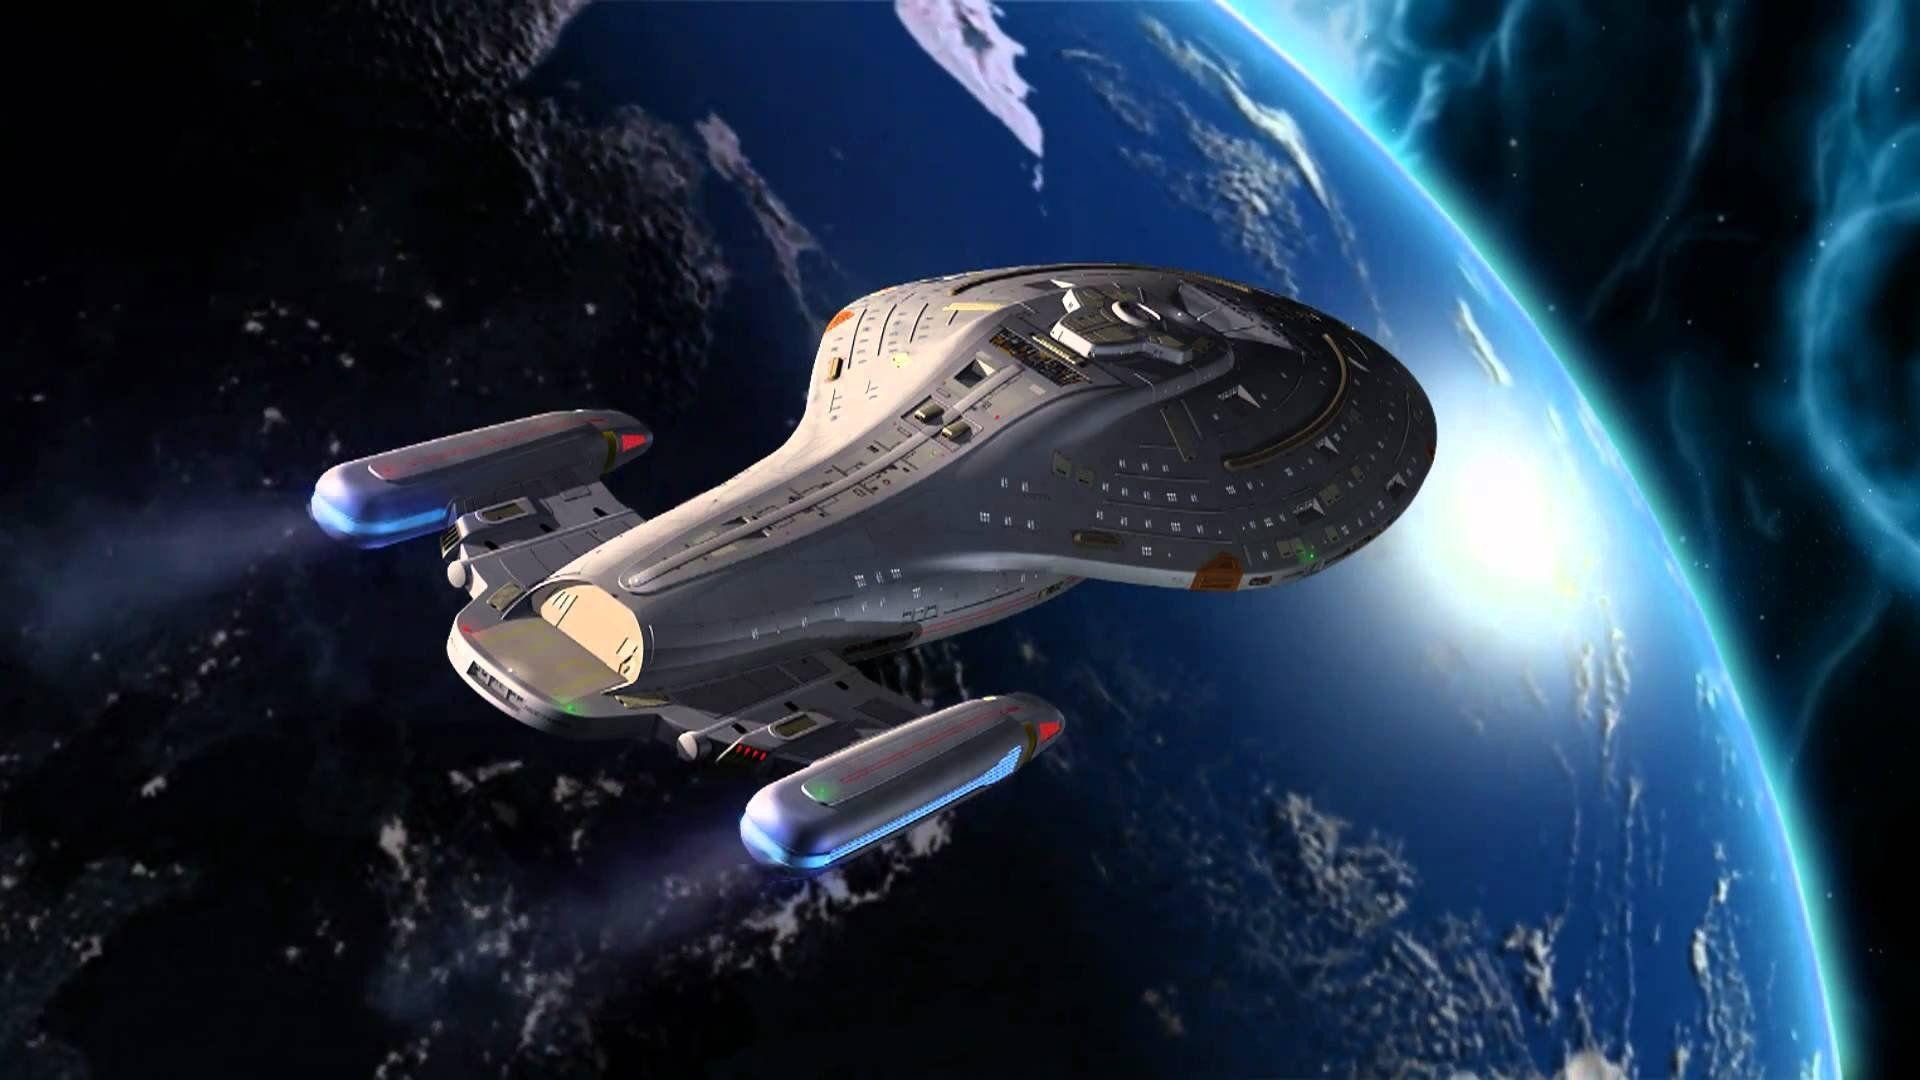 Star Trek Live Wallpaper Free